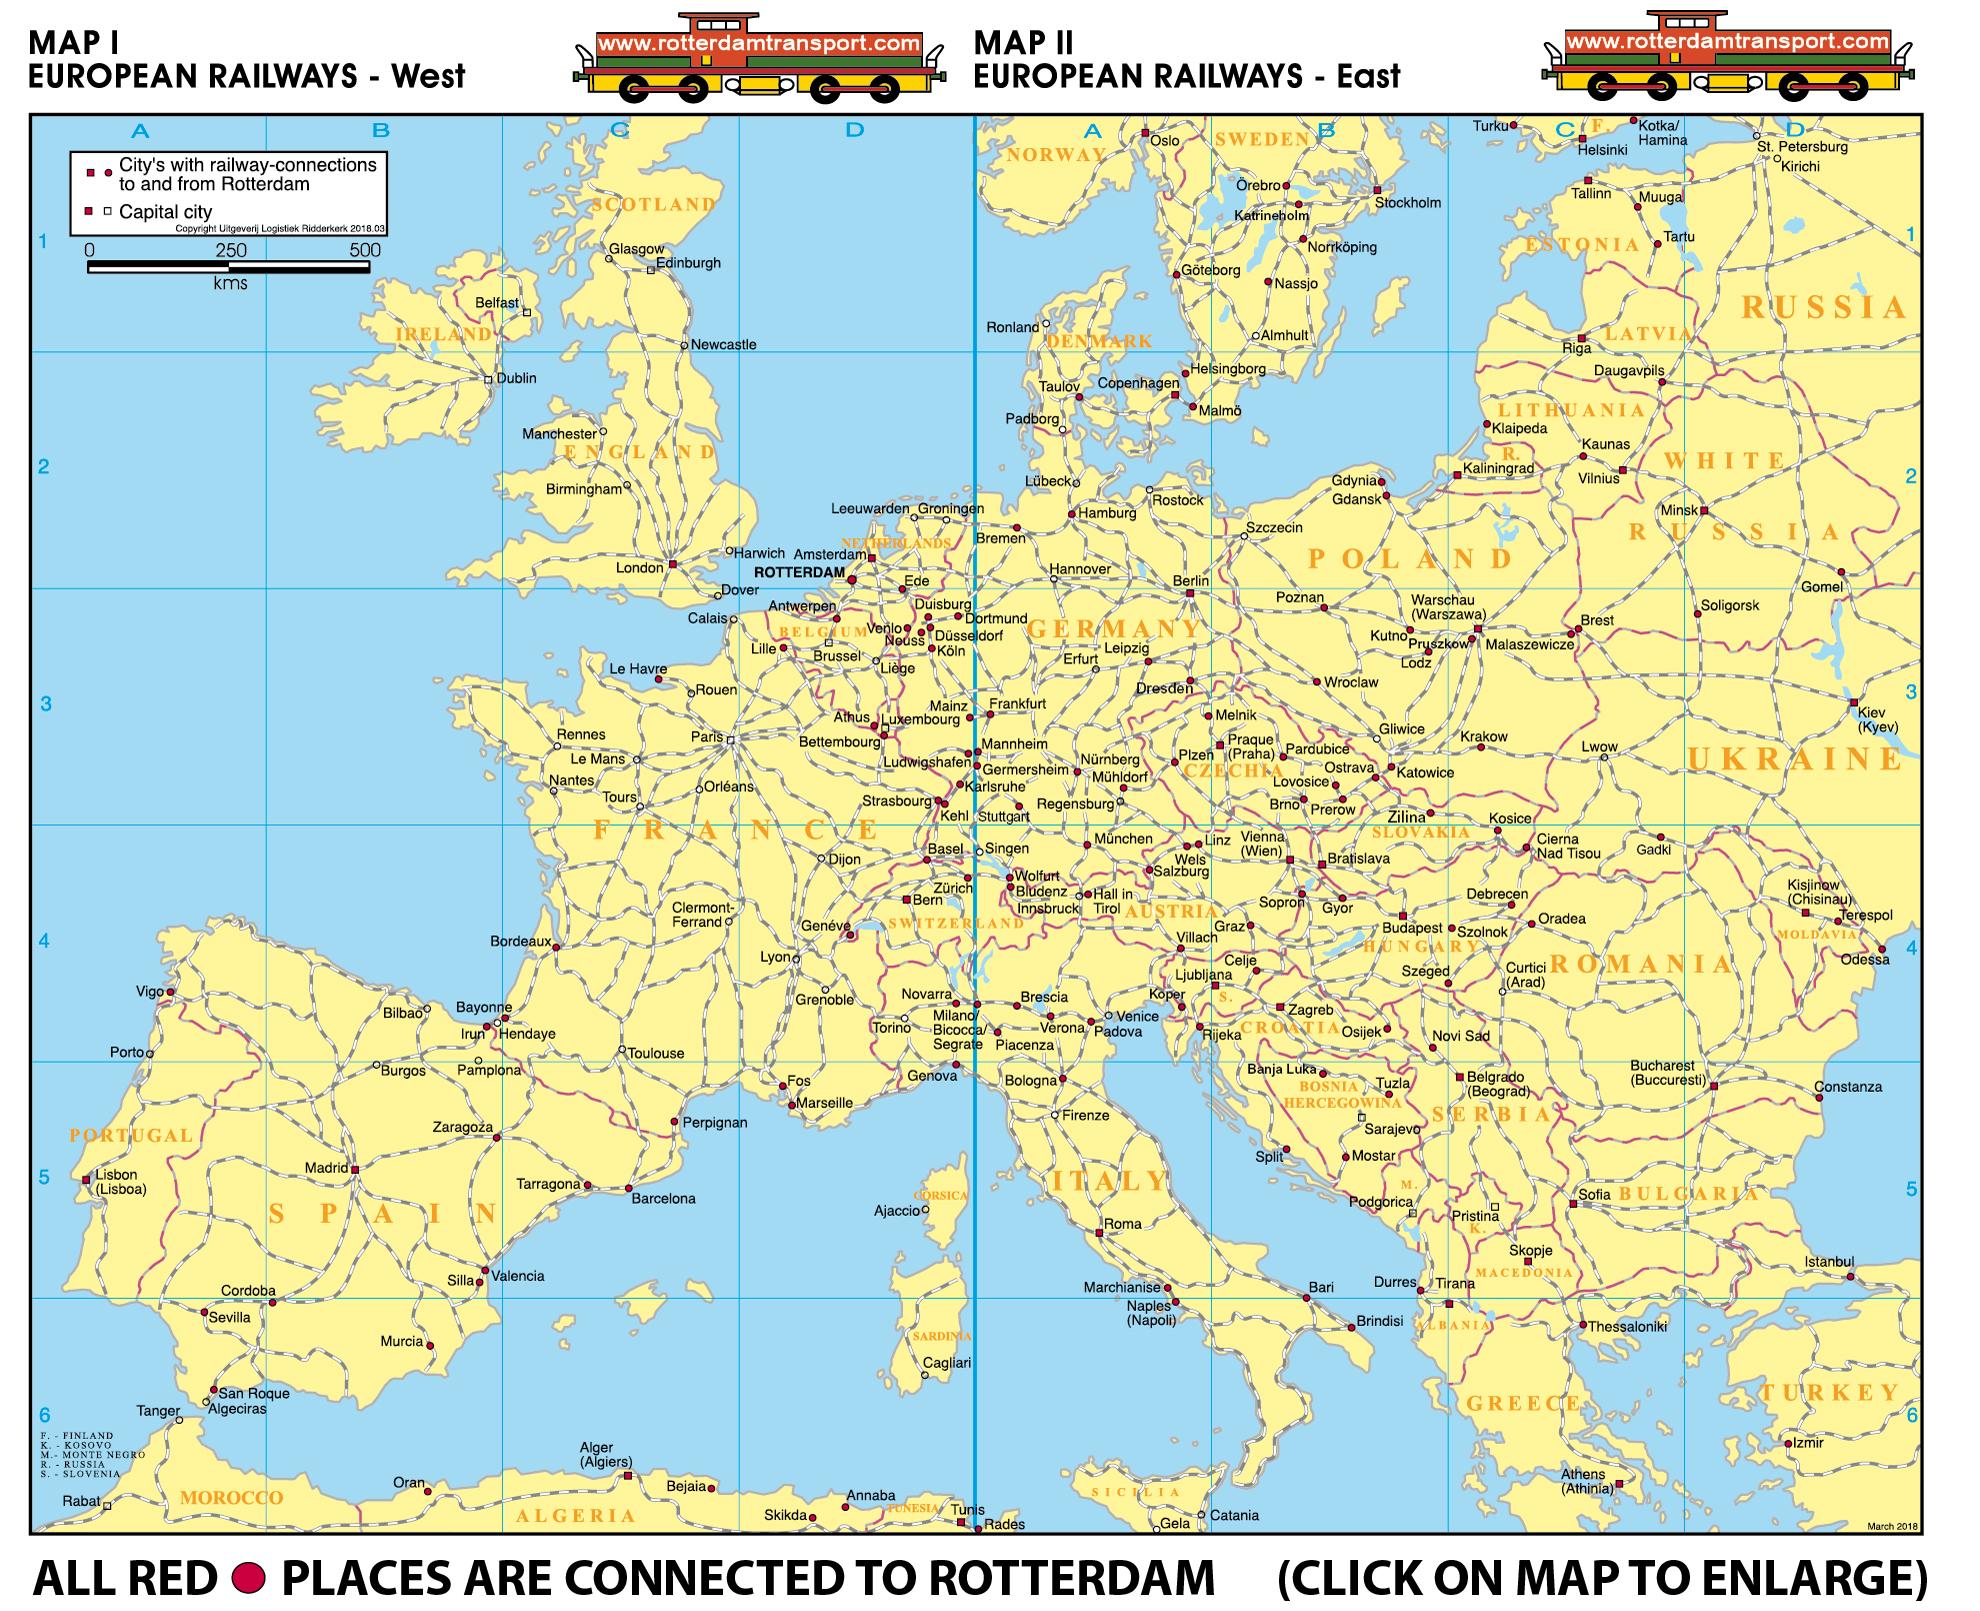 wwwrotterdamtransportcom maps railway traffic